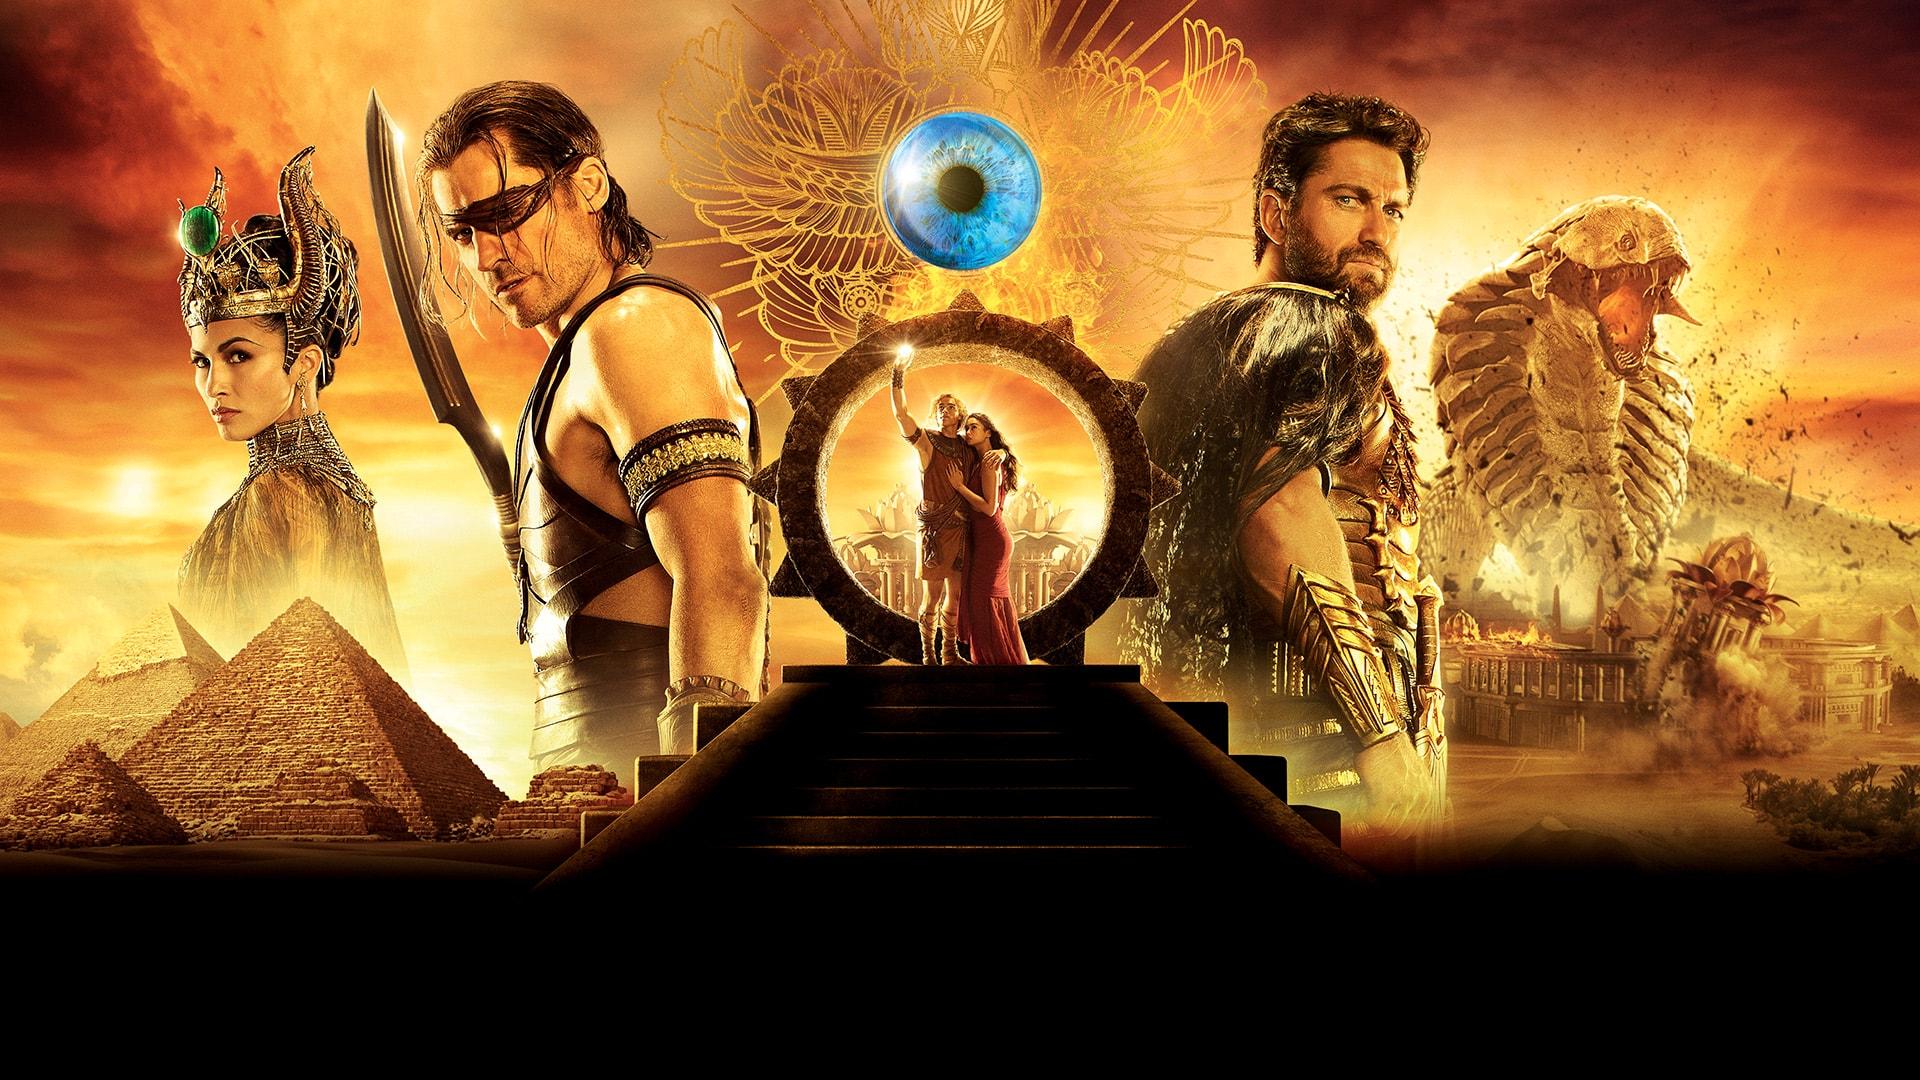 Gods of Egypt Desktop wallpapers